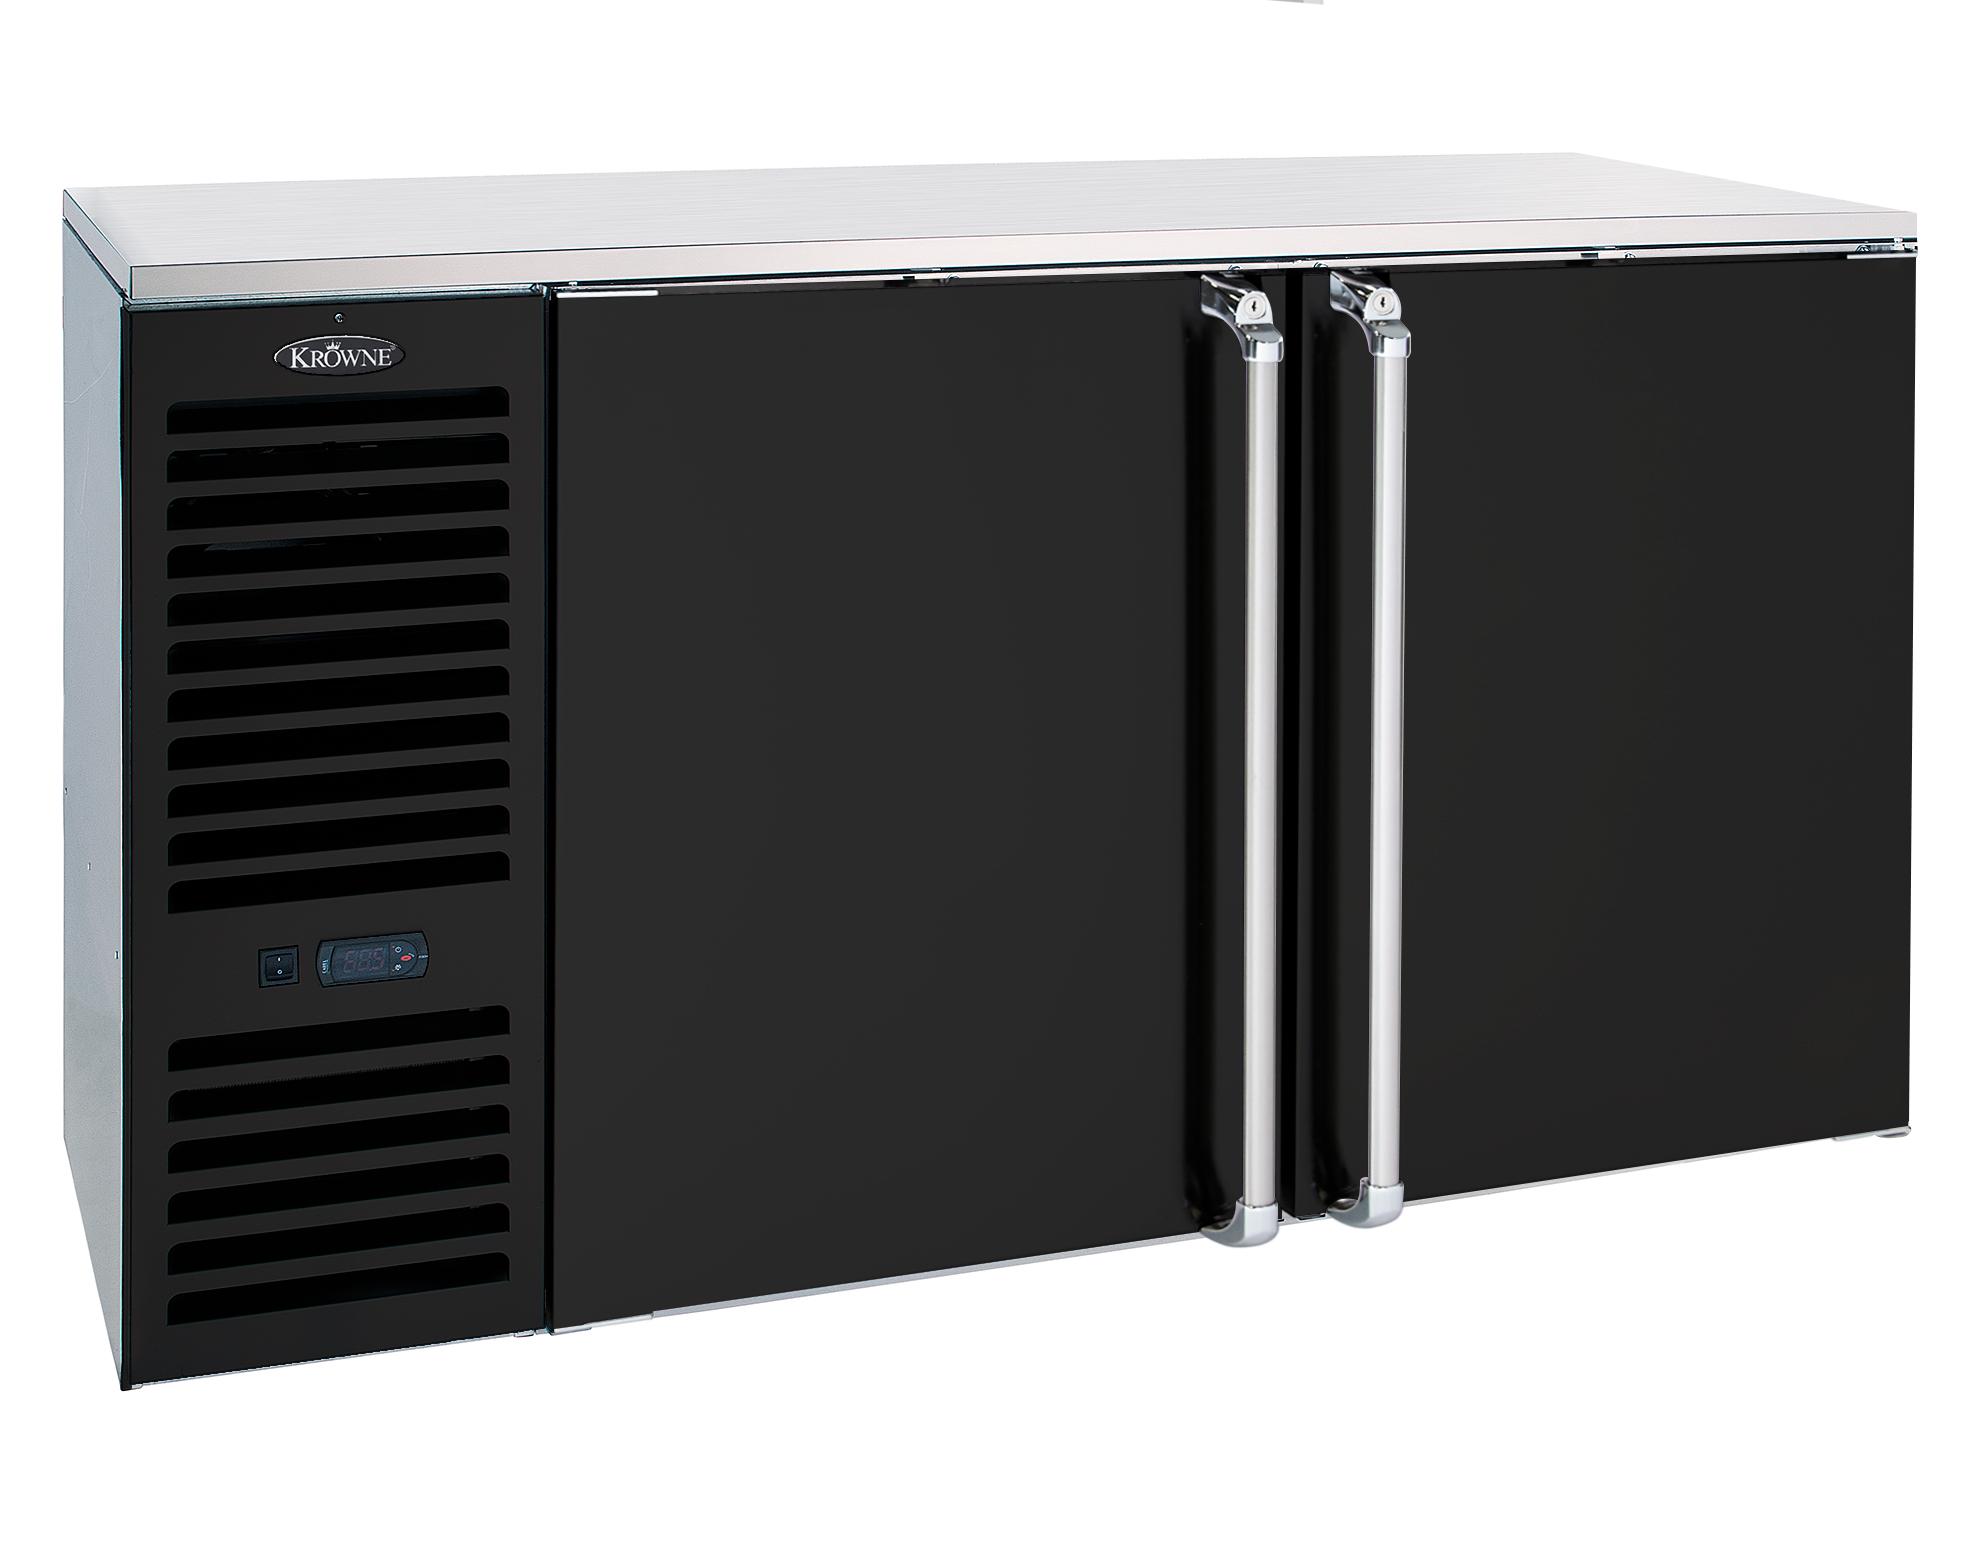 Krowne Metal BS60R-SSS refrigeration